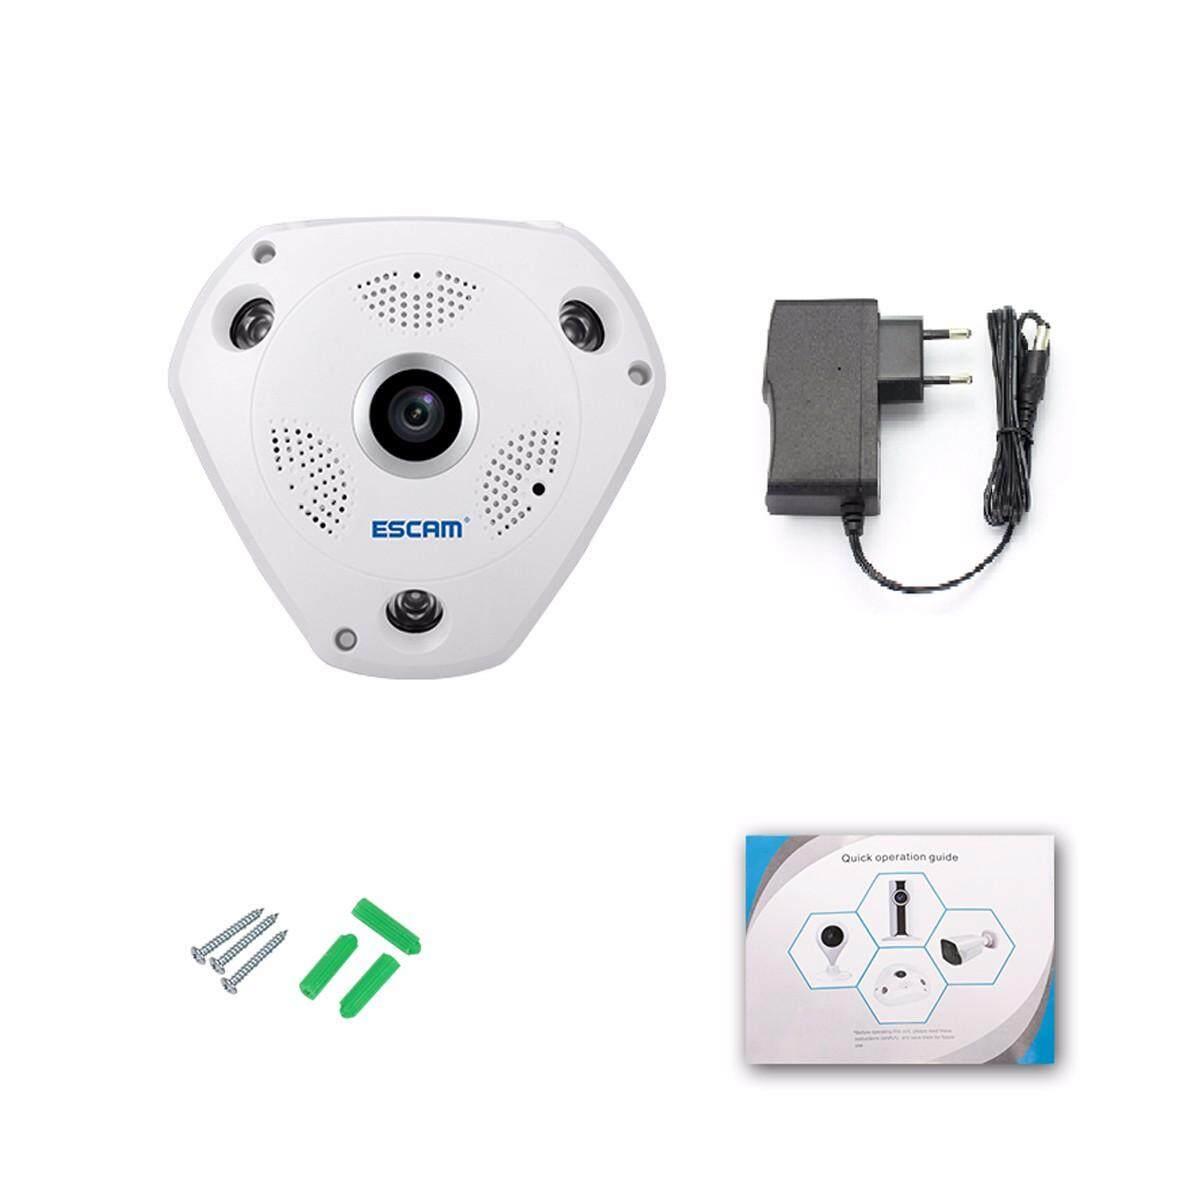 ESCAM Fisheye Camera Support VR Box QP180 Shark 960P IP WiFi Camera 1.3MP 360 Degree Panoramic Infrared Night Vision Camera - EU Plug - intl